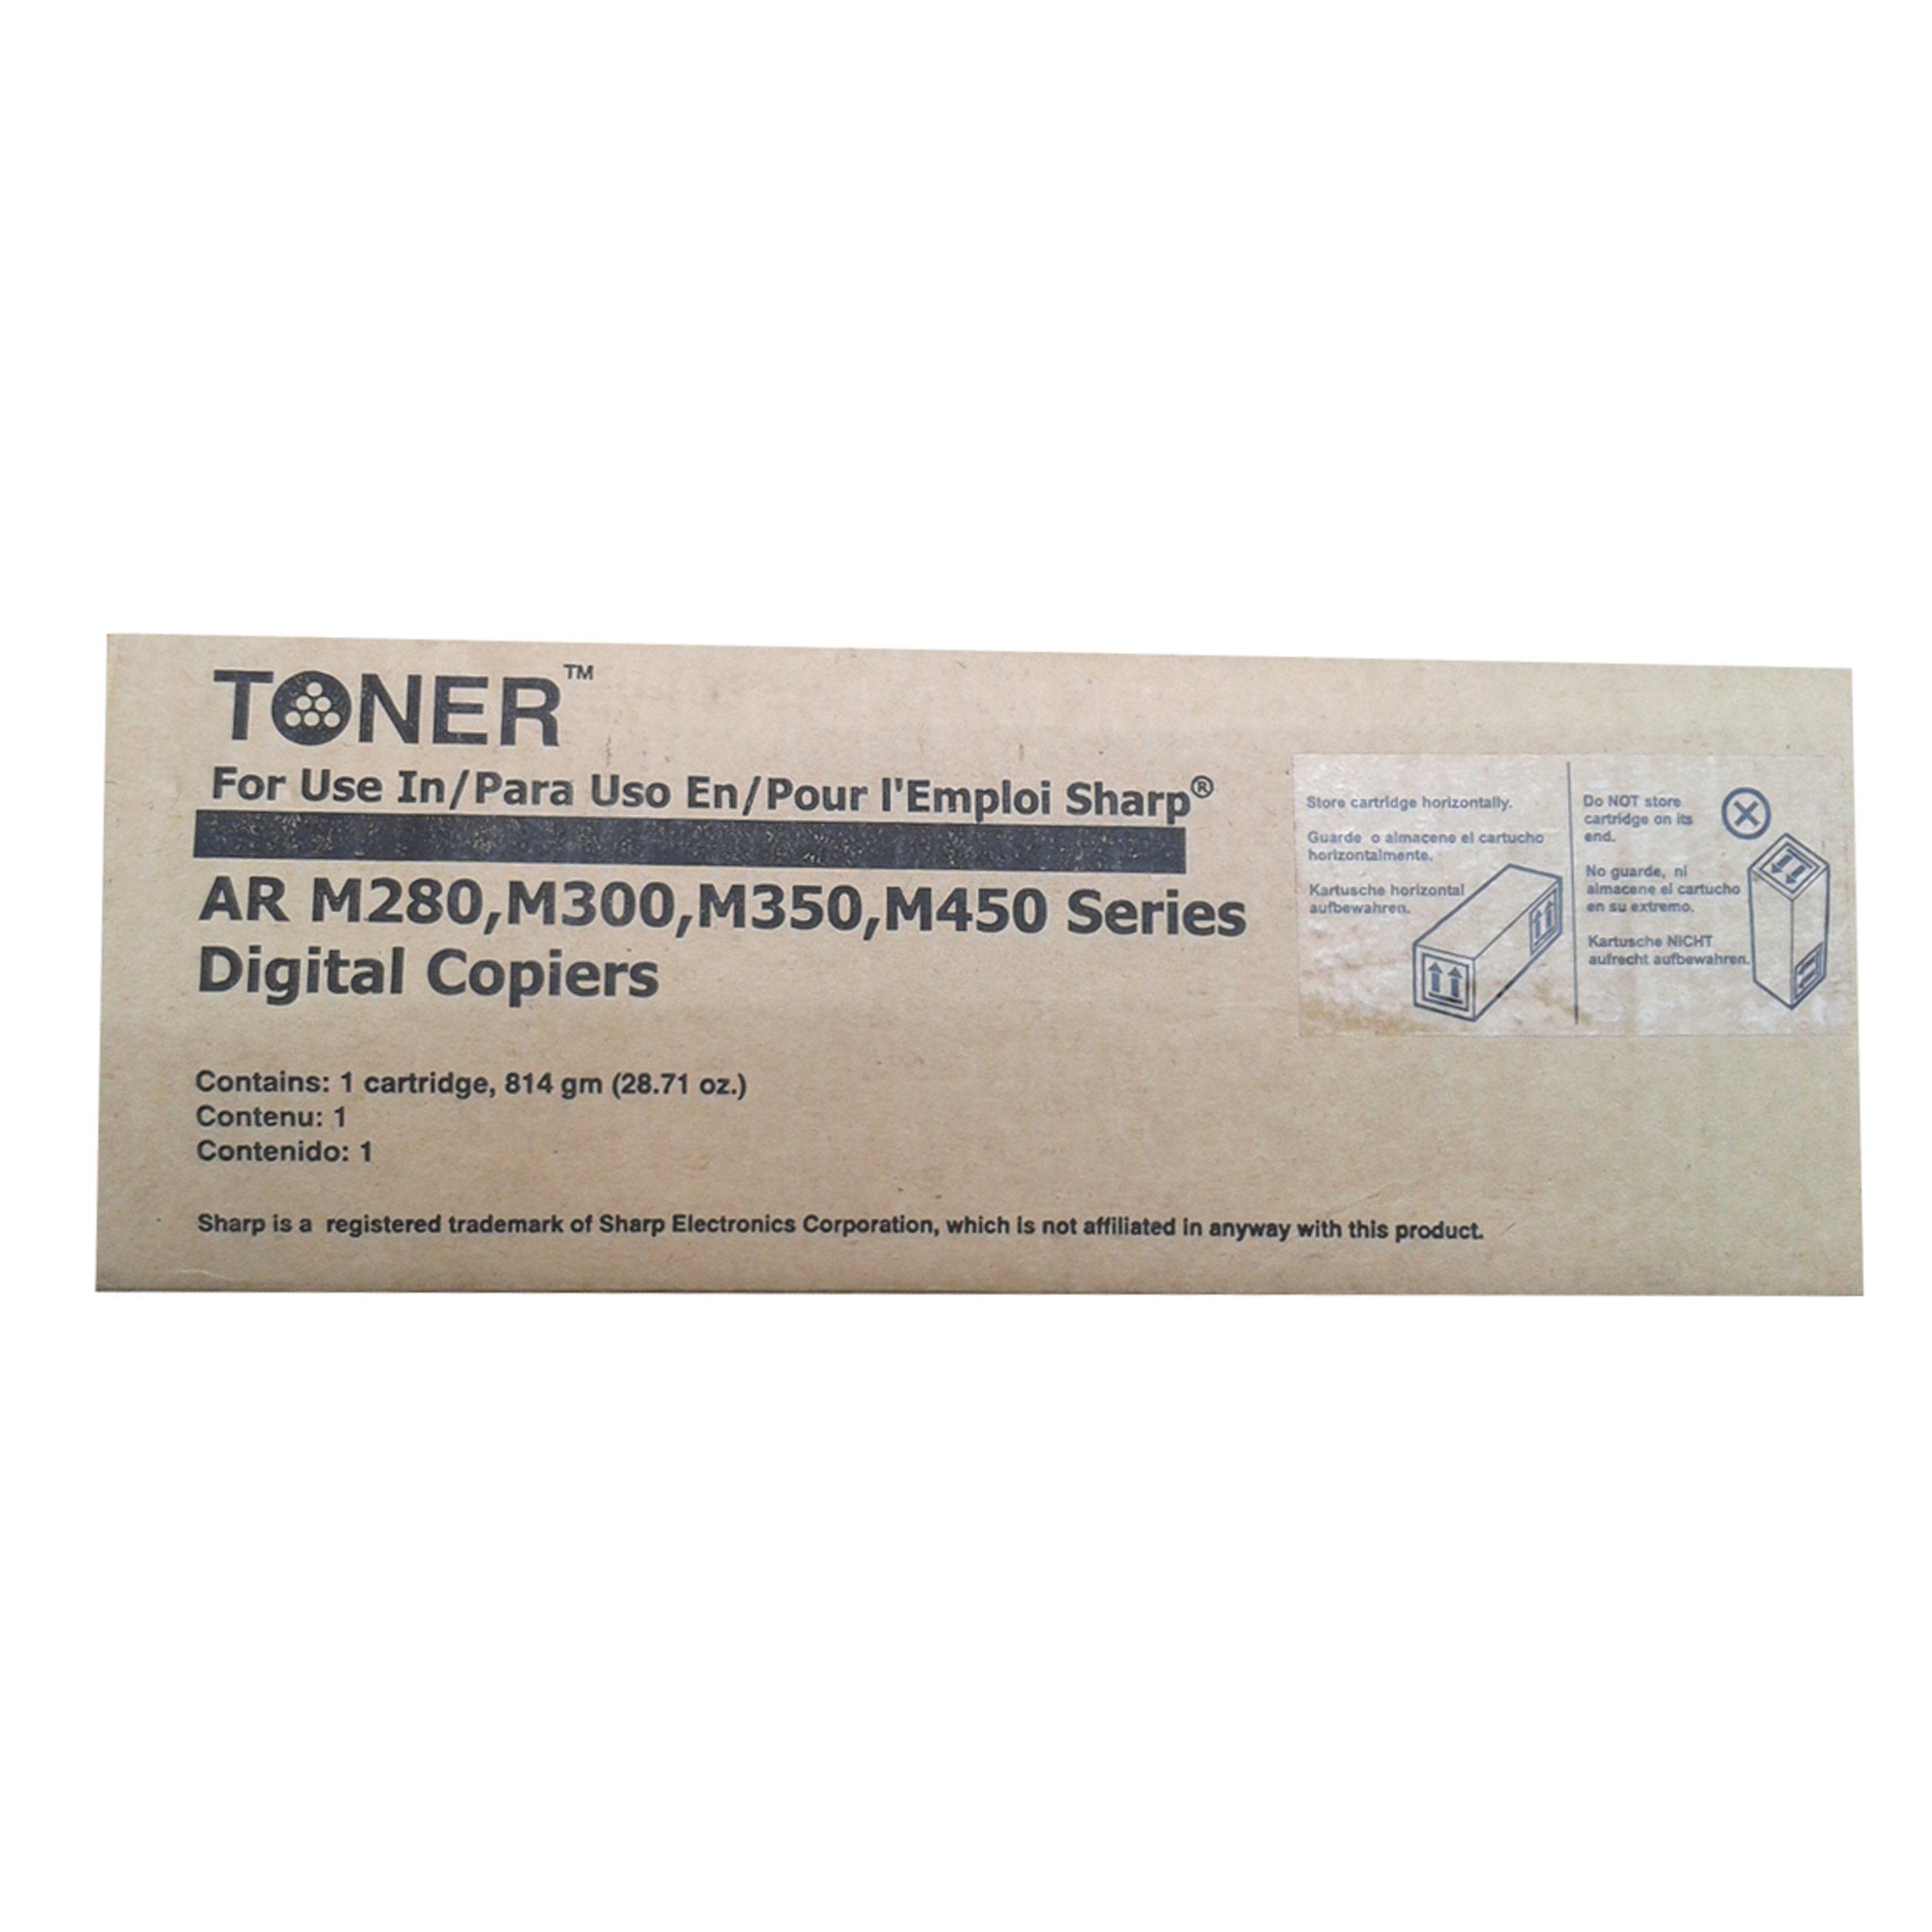 Toner AR M280, M300, M350, M450�digitale serie fotocopiatrici